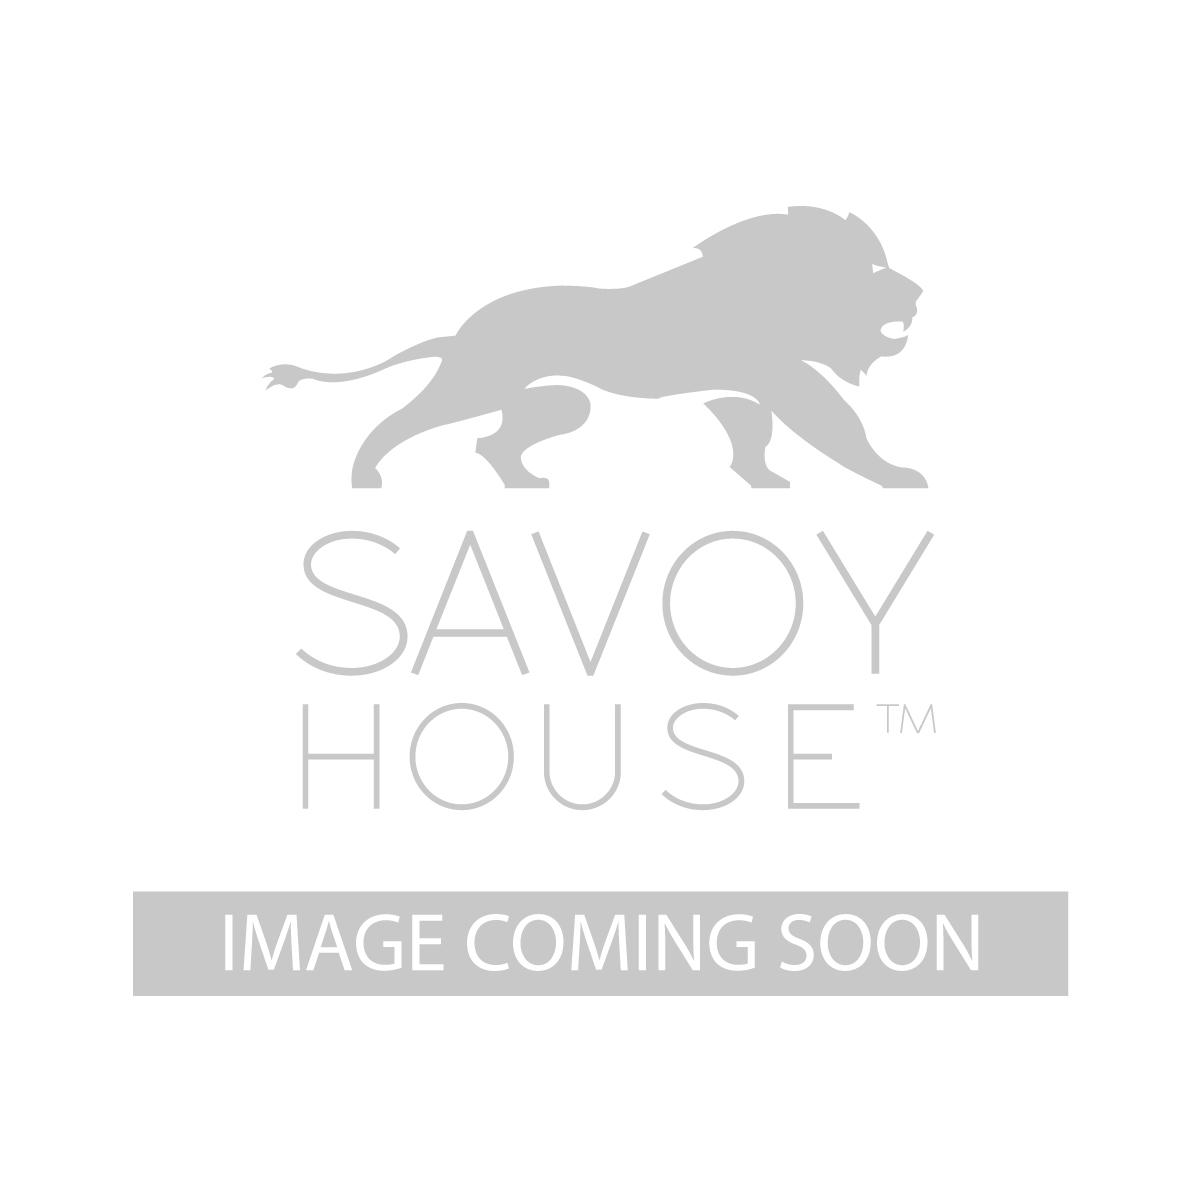 3 877 4 109 Ballard 4 Light Foyer By Savoy House